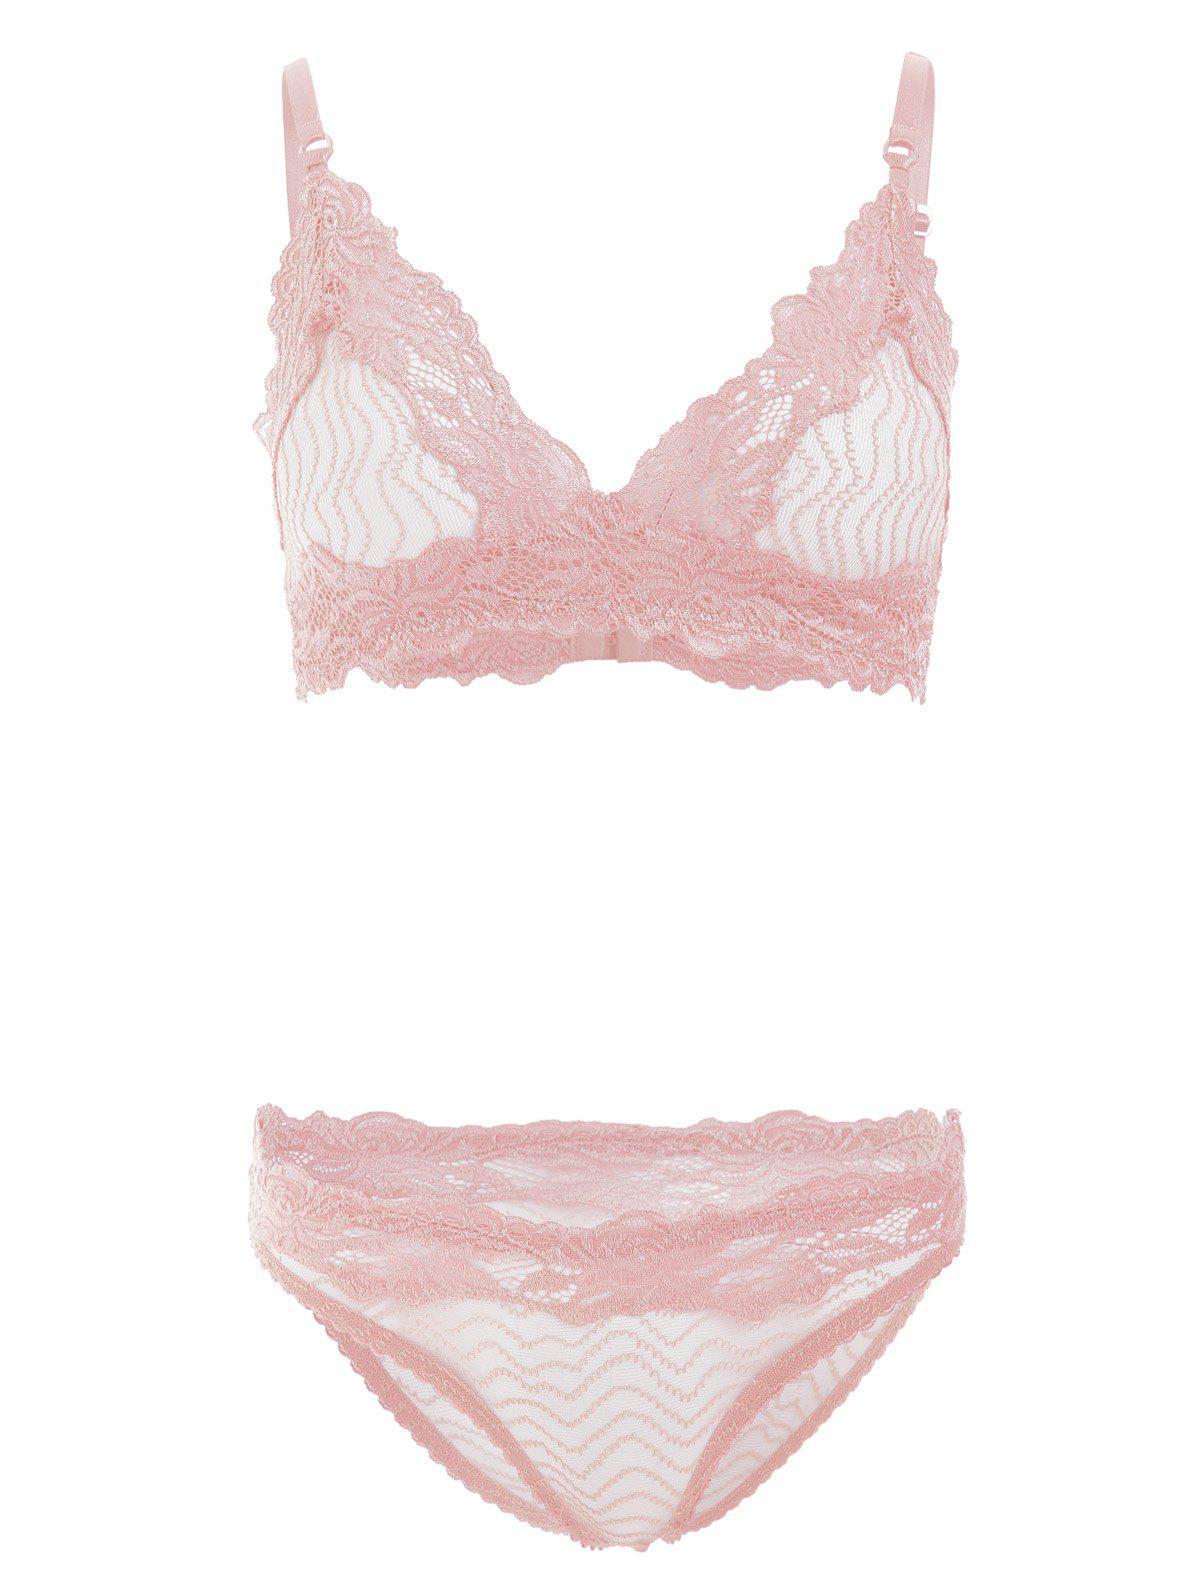 Sheer Lace Bra and Panties